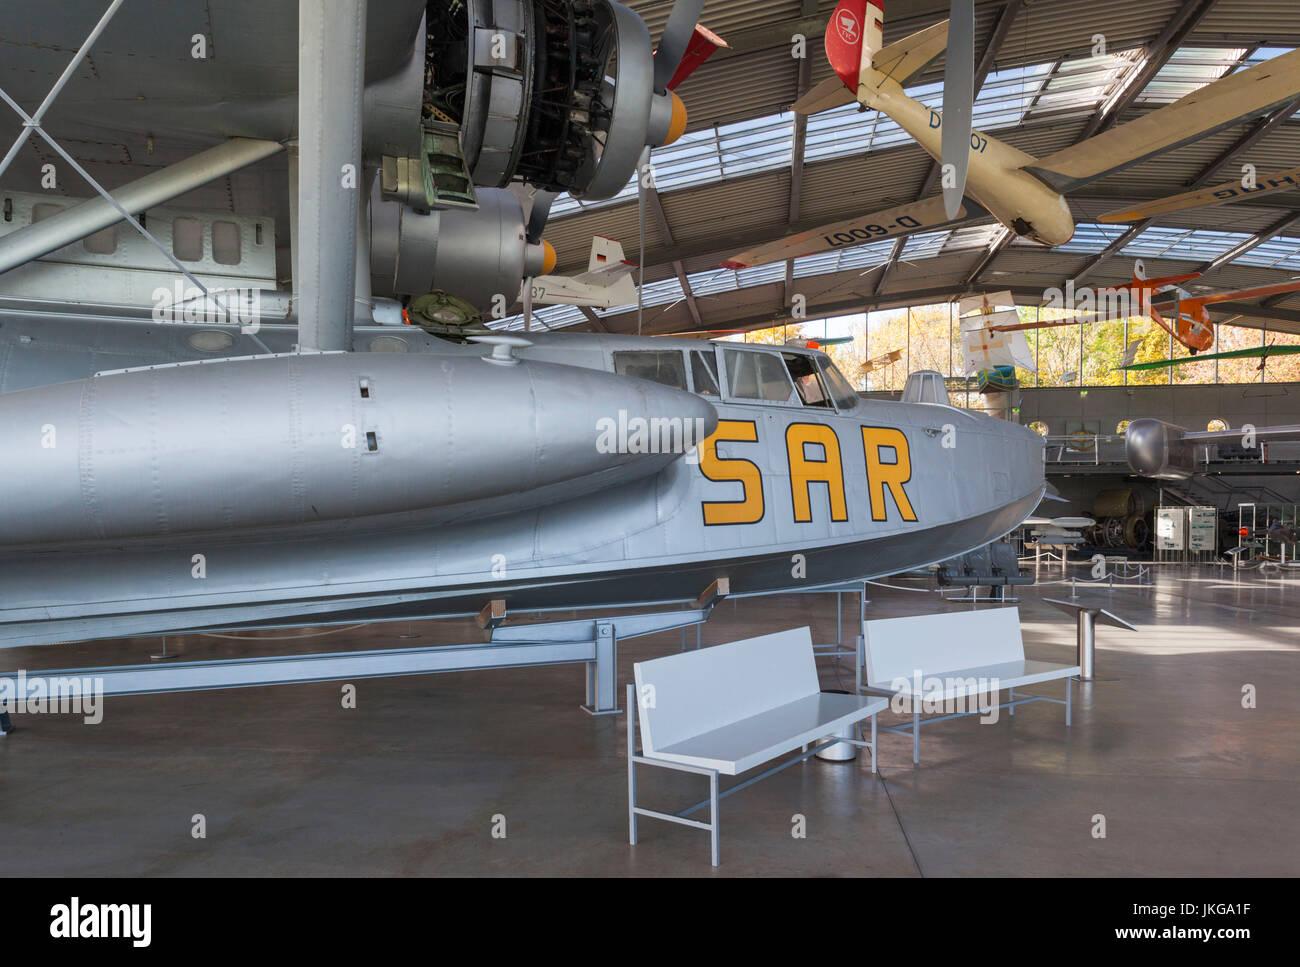 Germany, Bavaria, Munich - Oberschleissheim, Deutsches Museum Aviation Collection, housed at former NATO airfield, - Stock Image